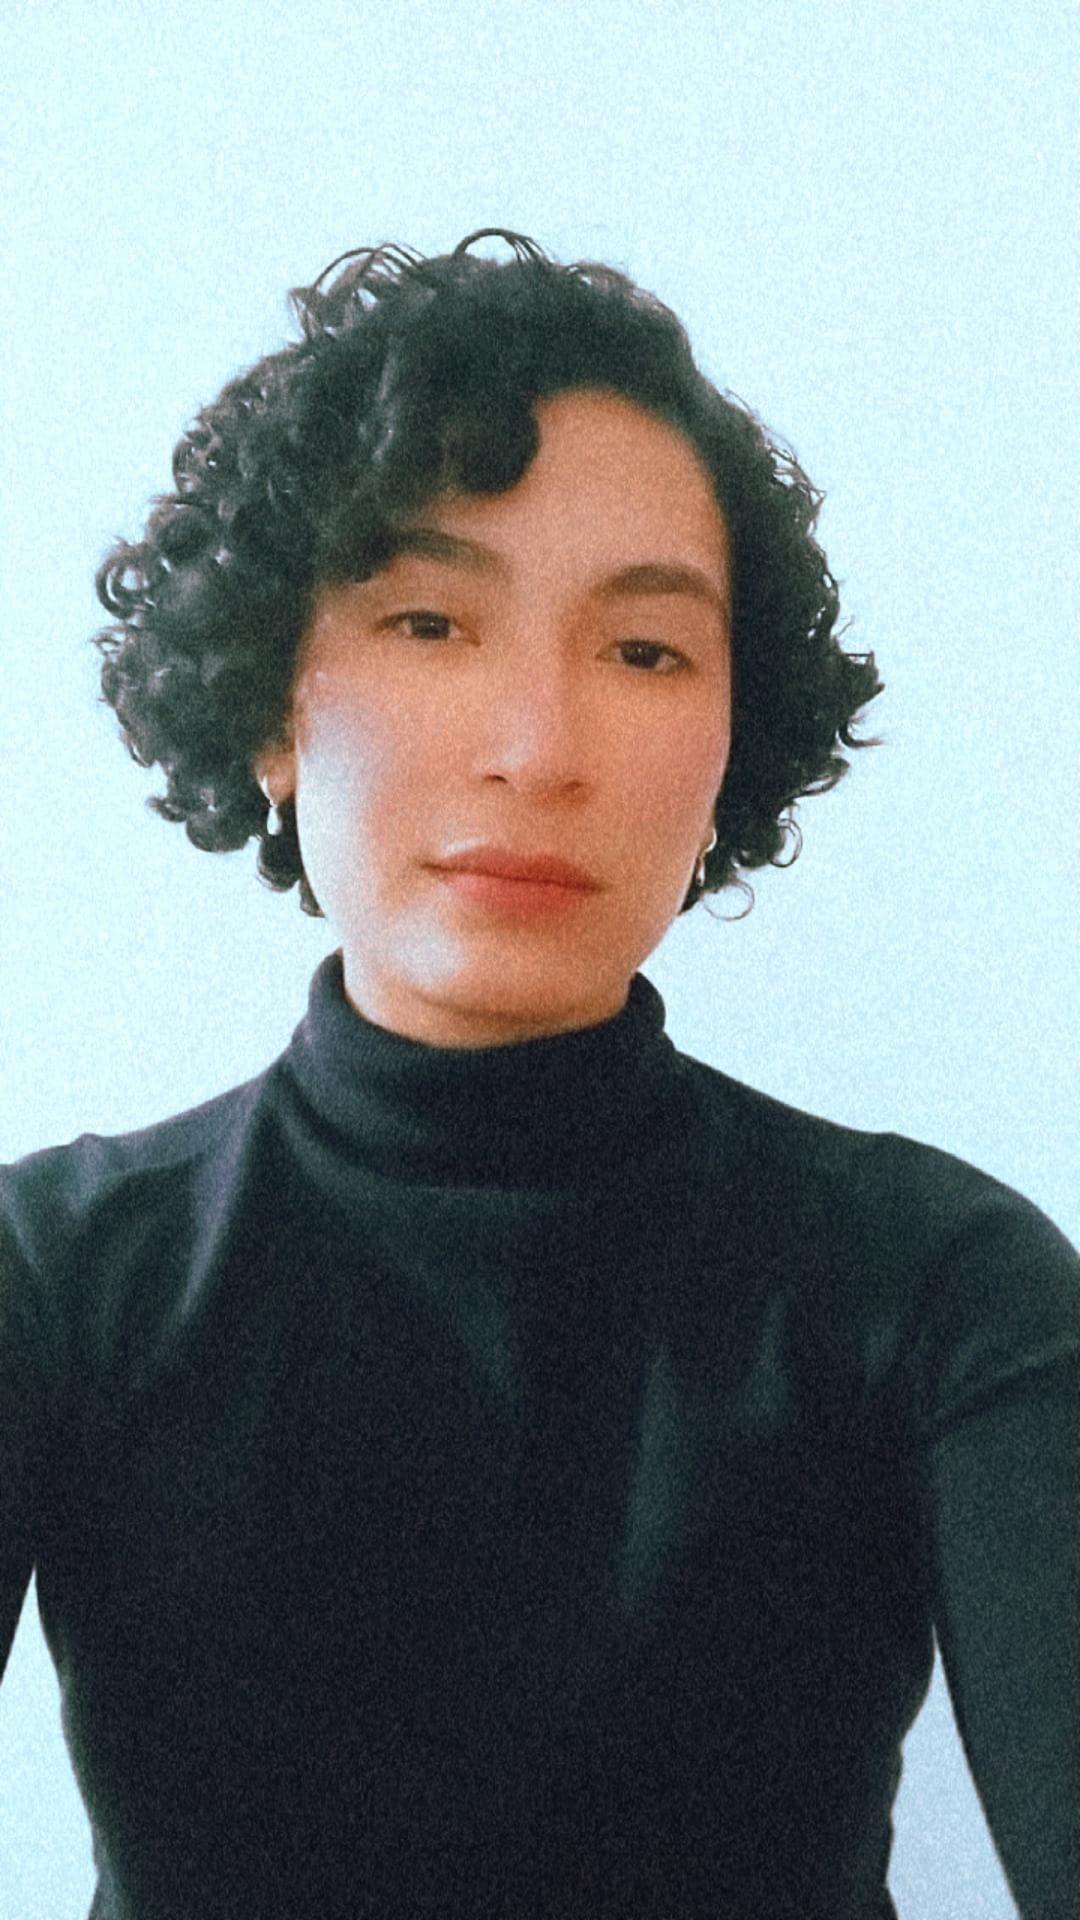 Ana Lúcia Lima